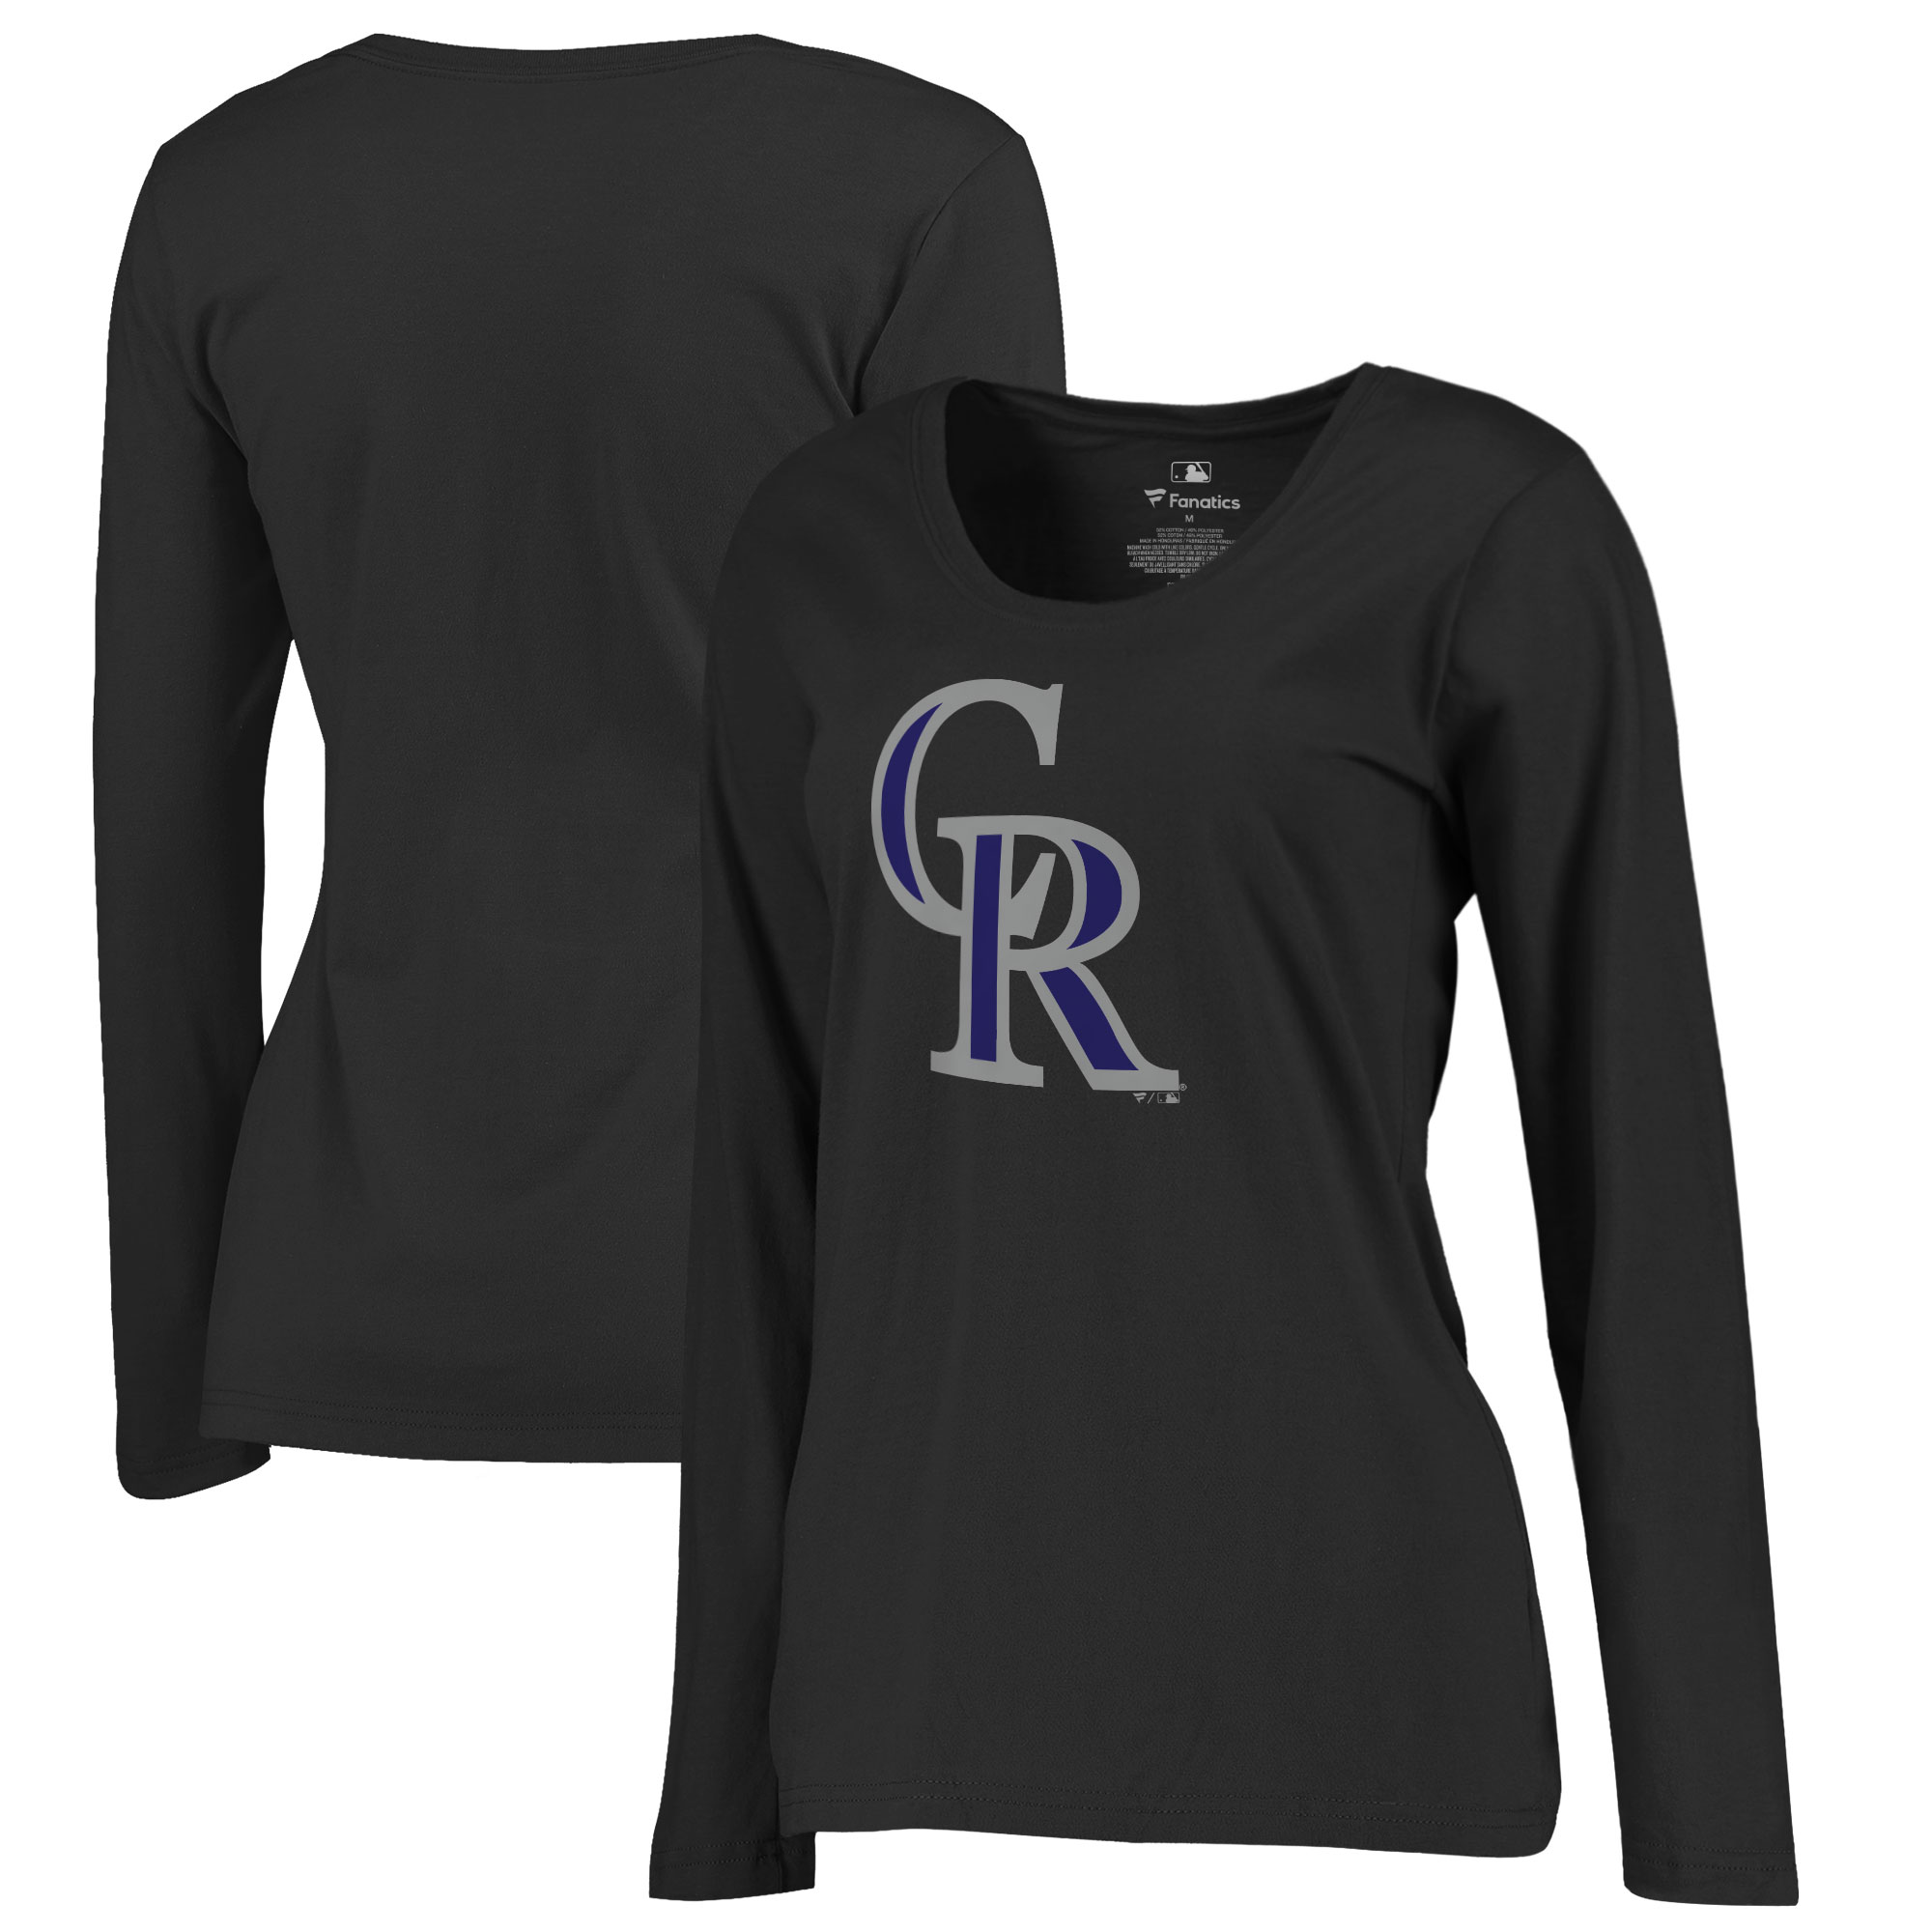 Colorado Rockies Women's Plus Sizes Primary Team Logo Long Sleeve T-Shirt - Black